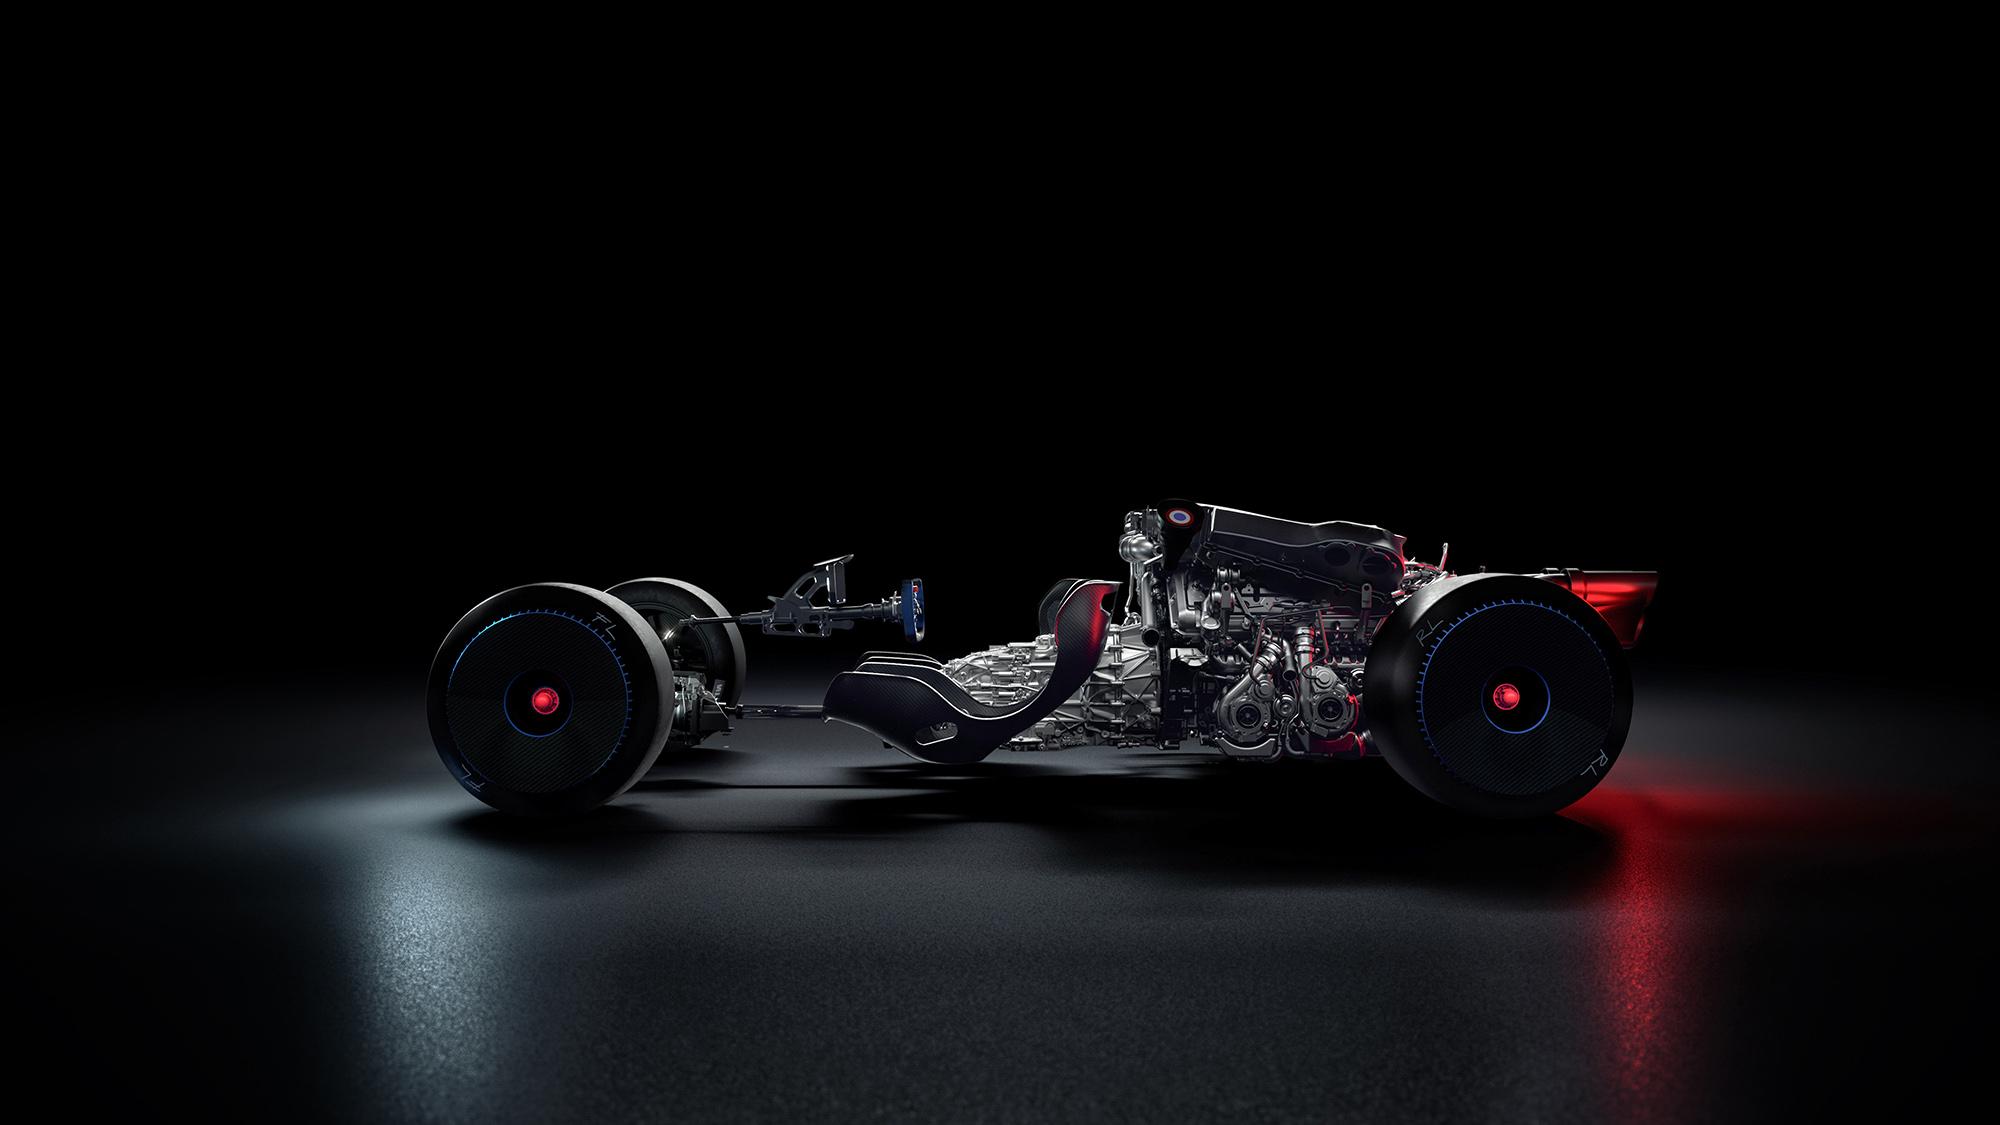 Bugatti Bolide chassis and engine